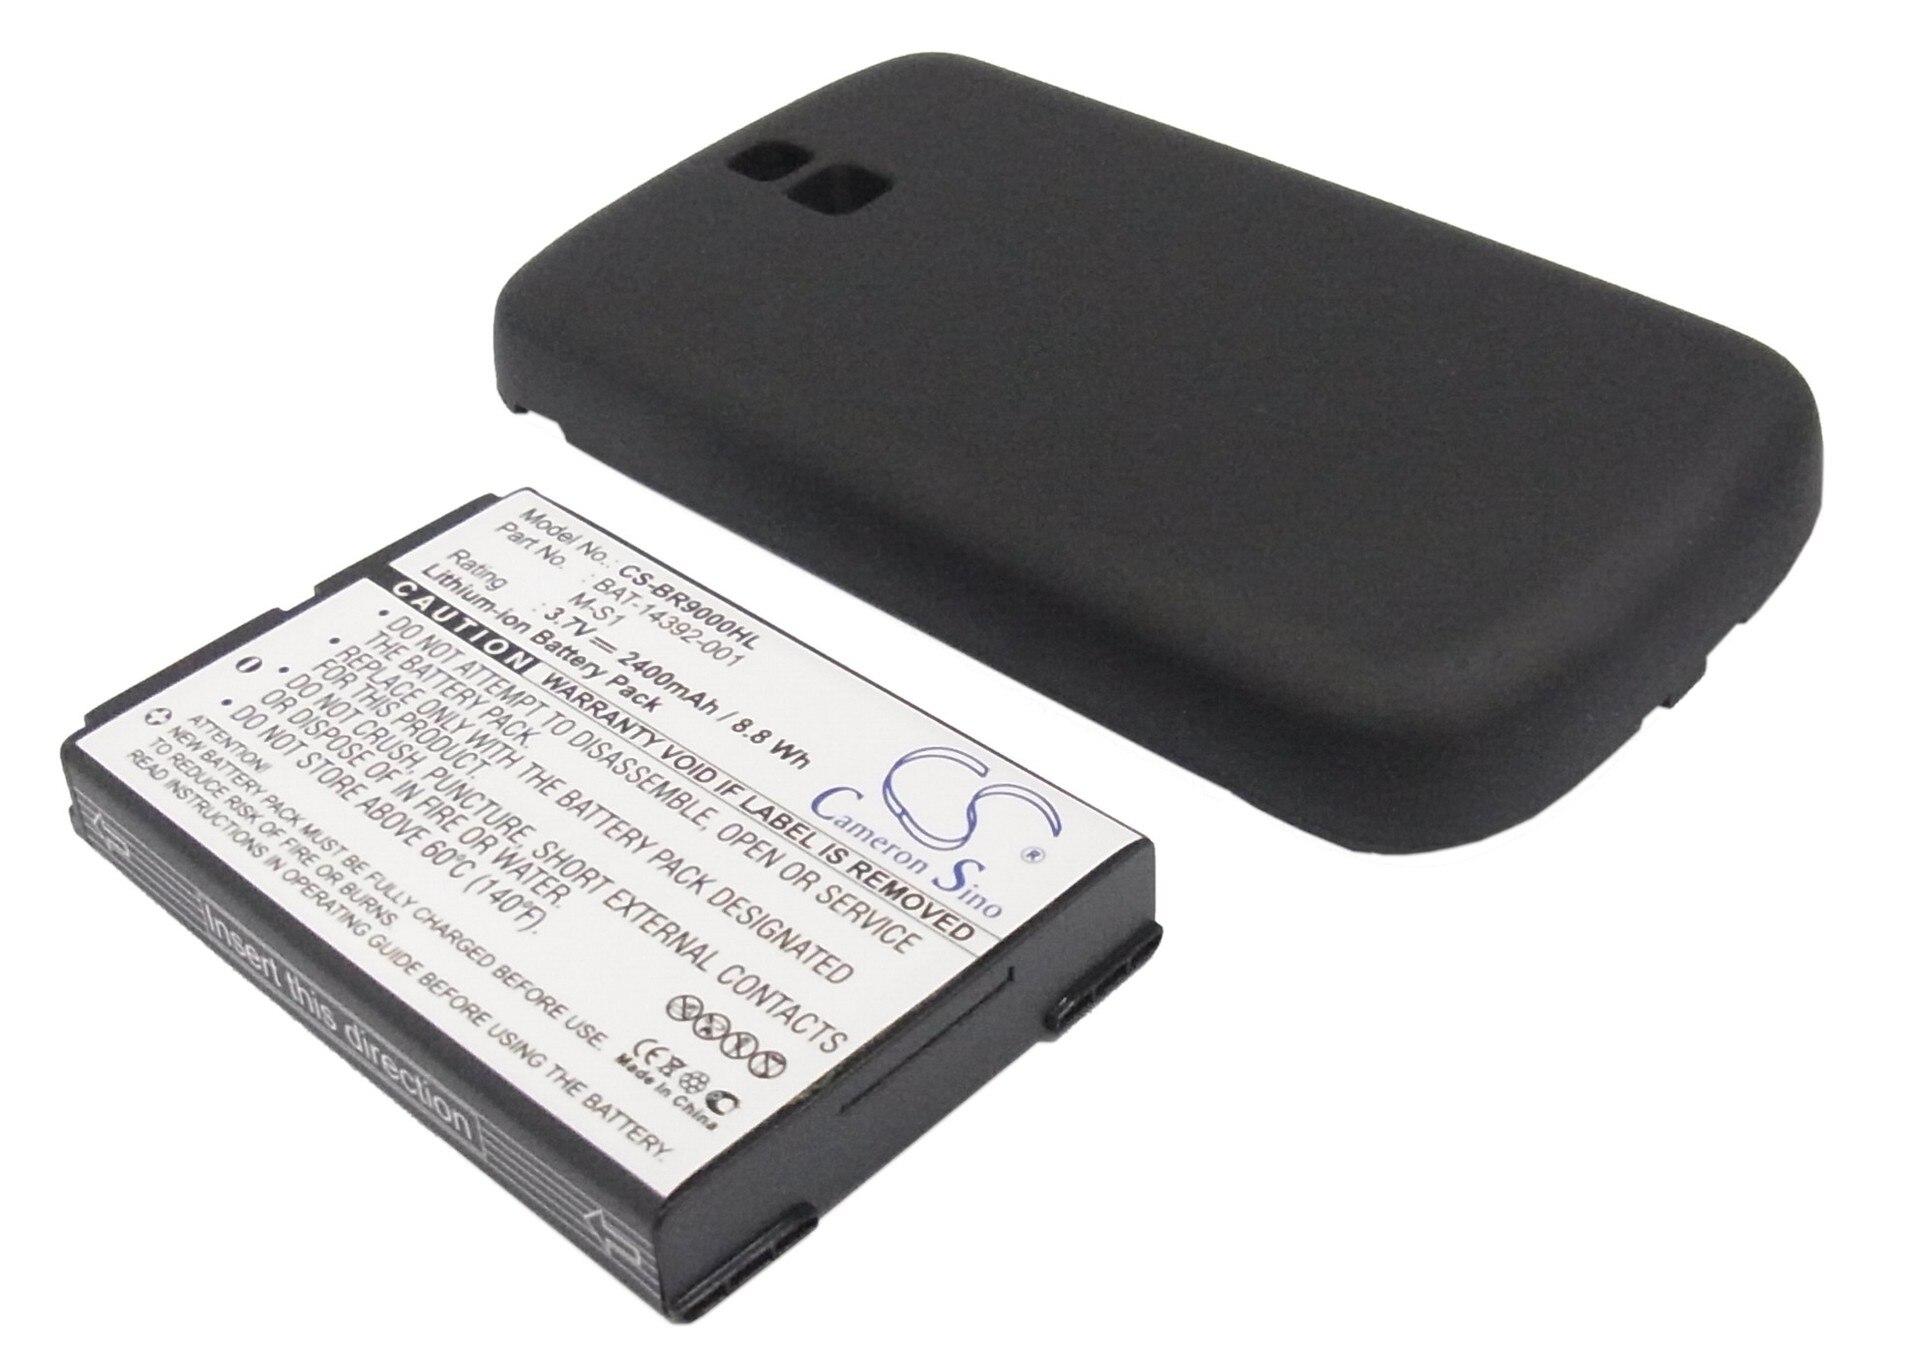 Cameron Sino 2400mah batería para BLACKBERRY Bold 9000 Niagara 9030 M-S1 bate-1439 AT&T audaz T-COM WS 0130